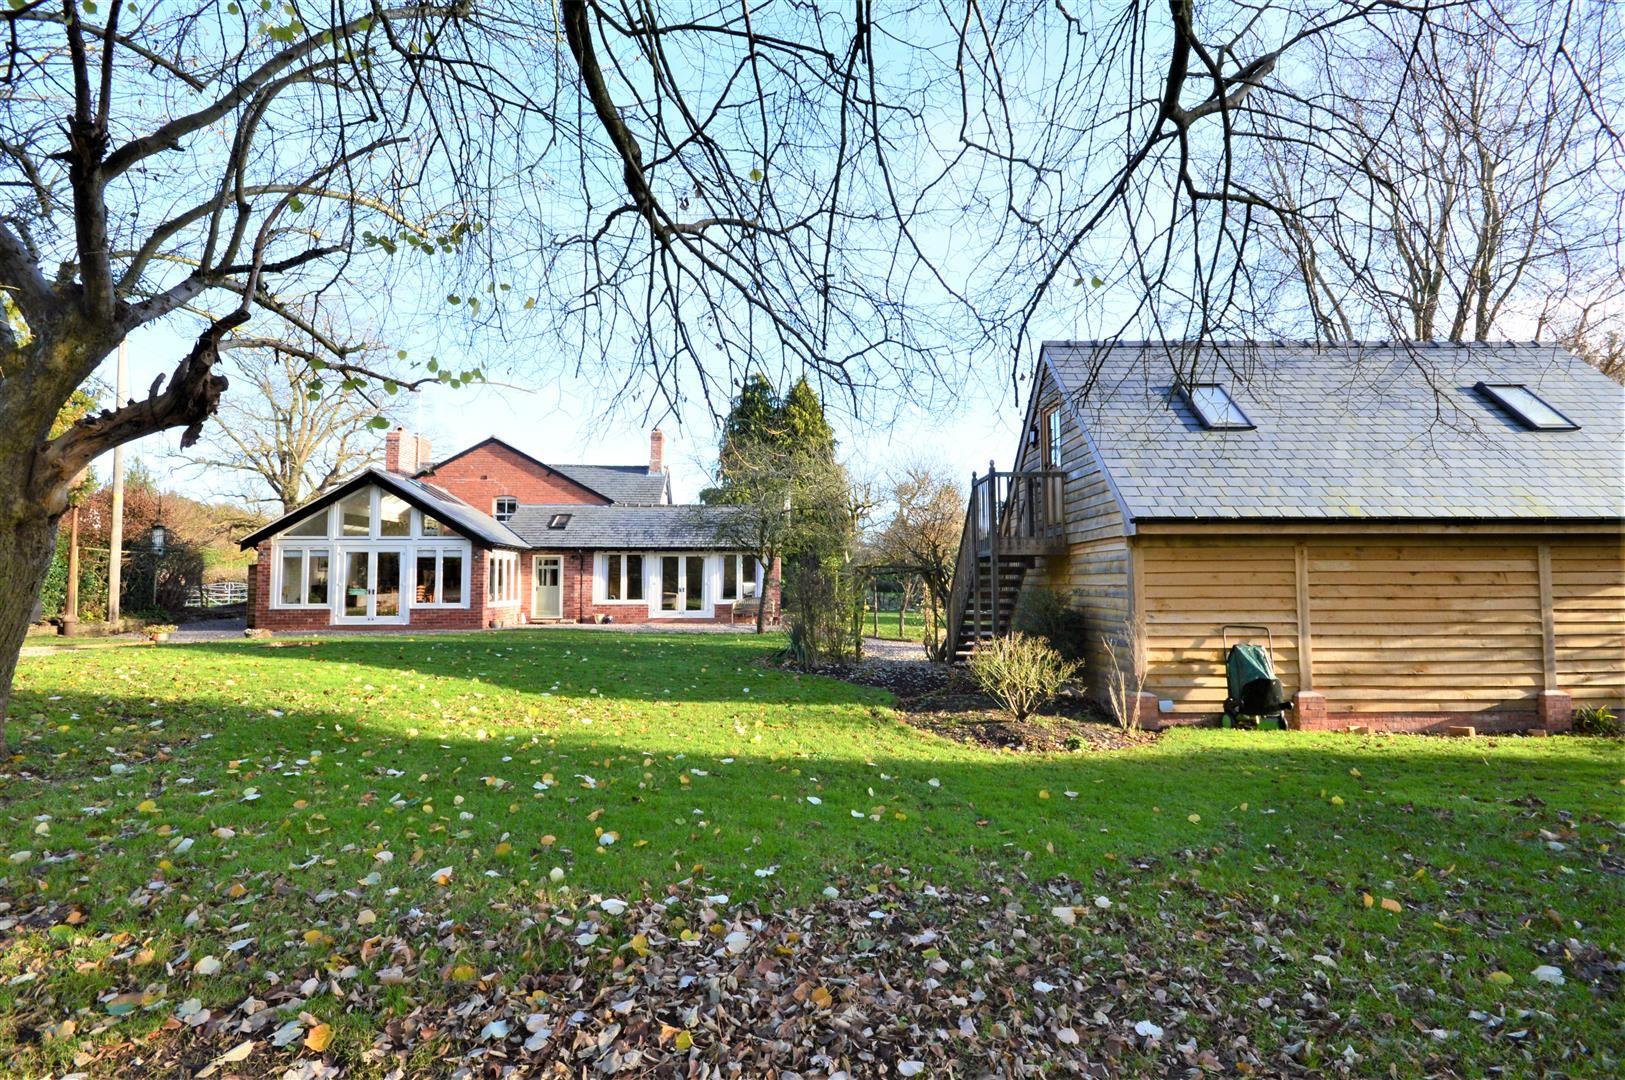 4 bed detached for sale in Bodenham, HR1